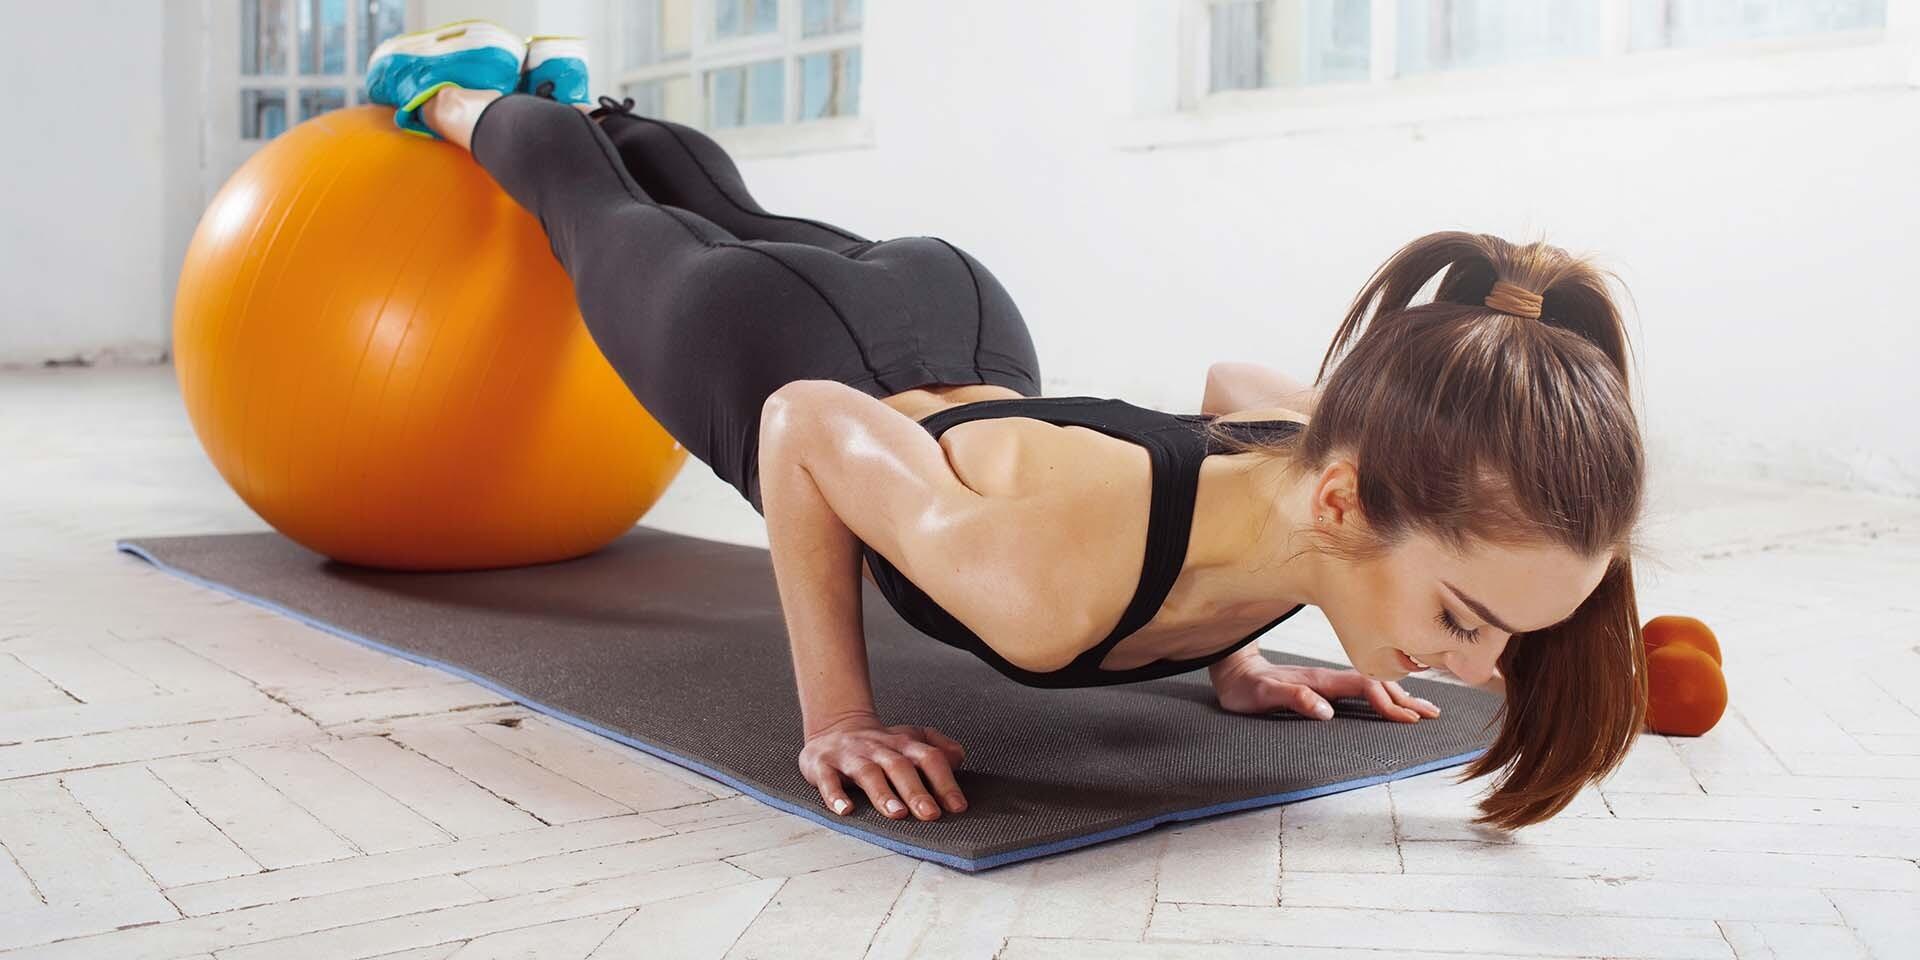 Pilates, fitlopty alebo Port De Bras v Sunflowerstudiu na rok 2020